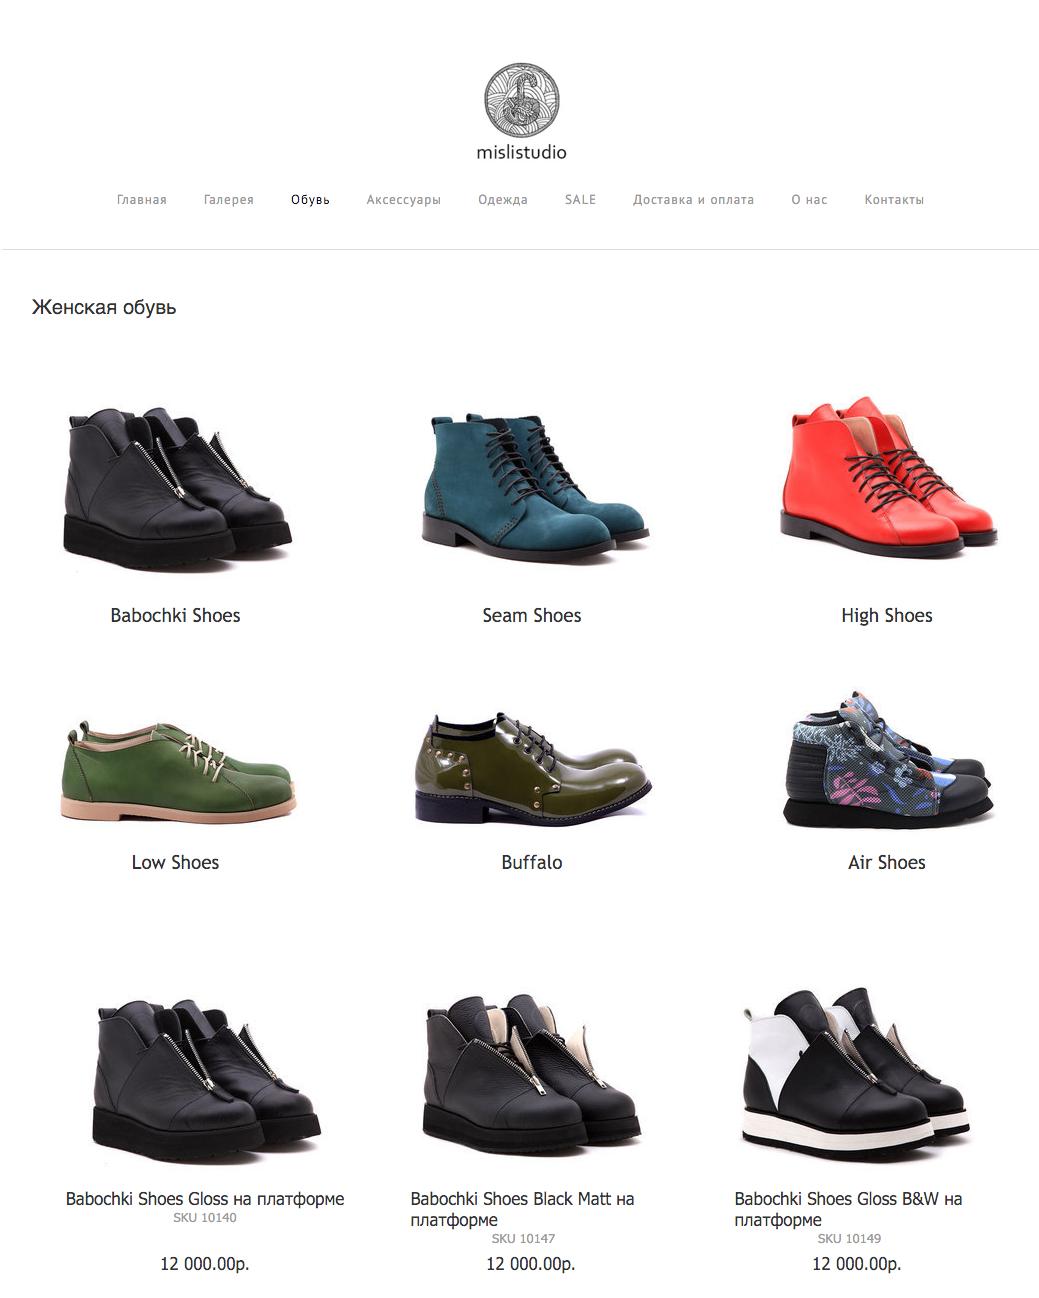 d35ef3ddc5c Интернет-магазины обуви на Эквиде